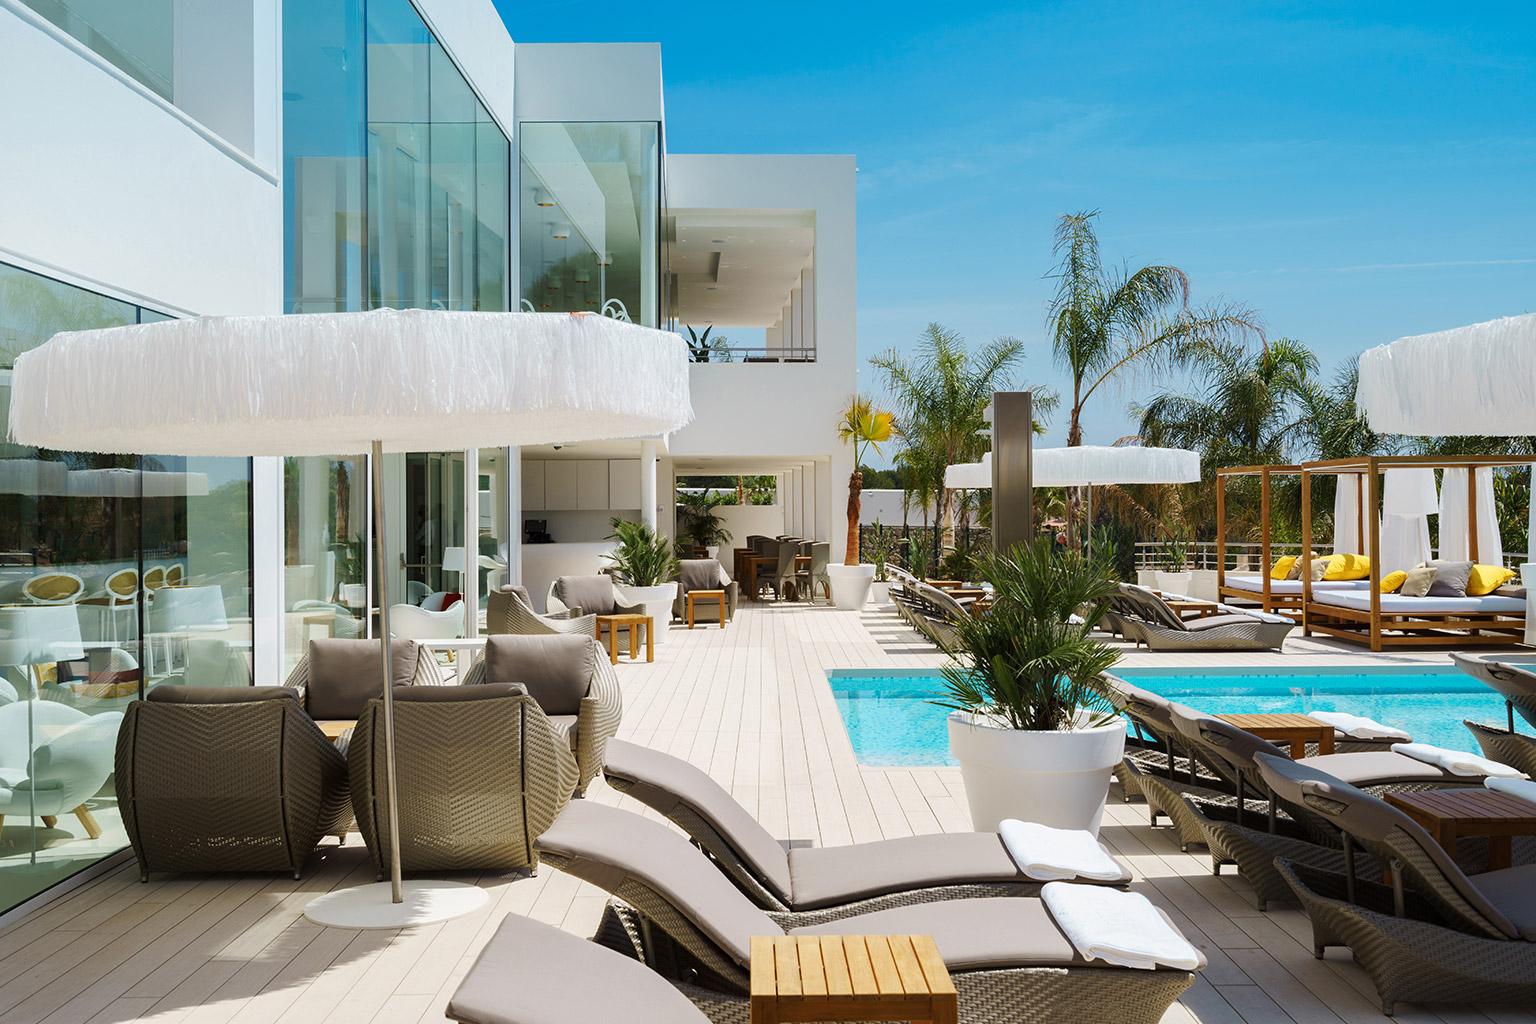 Portal hills boutique hotel designreisen for Mallorca design hotel